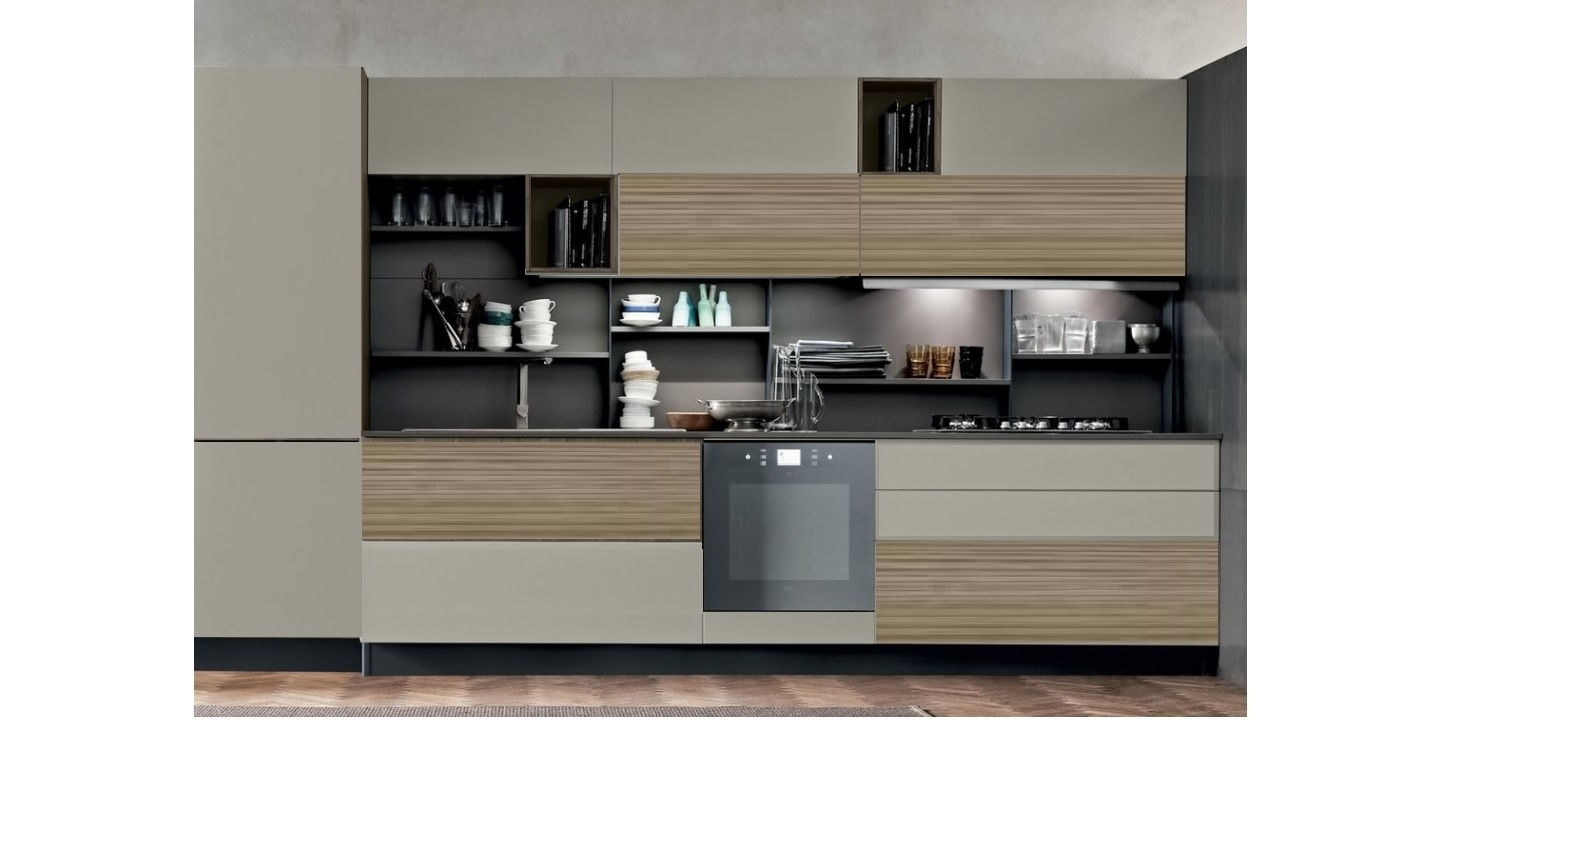 Design outlet arredamento i love design outlet for Di bari arredamenti outlet